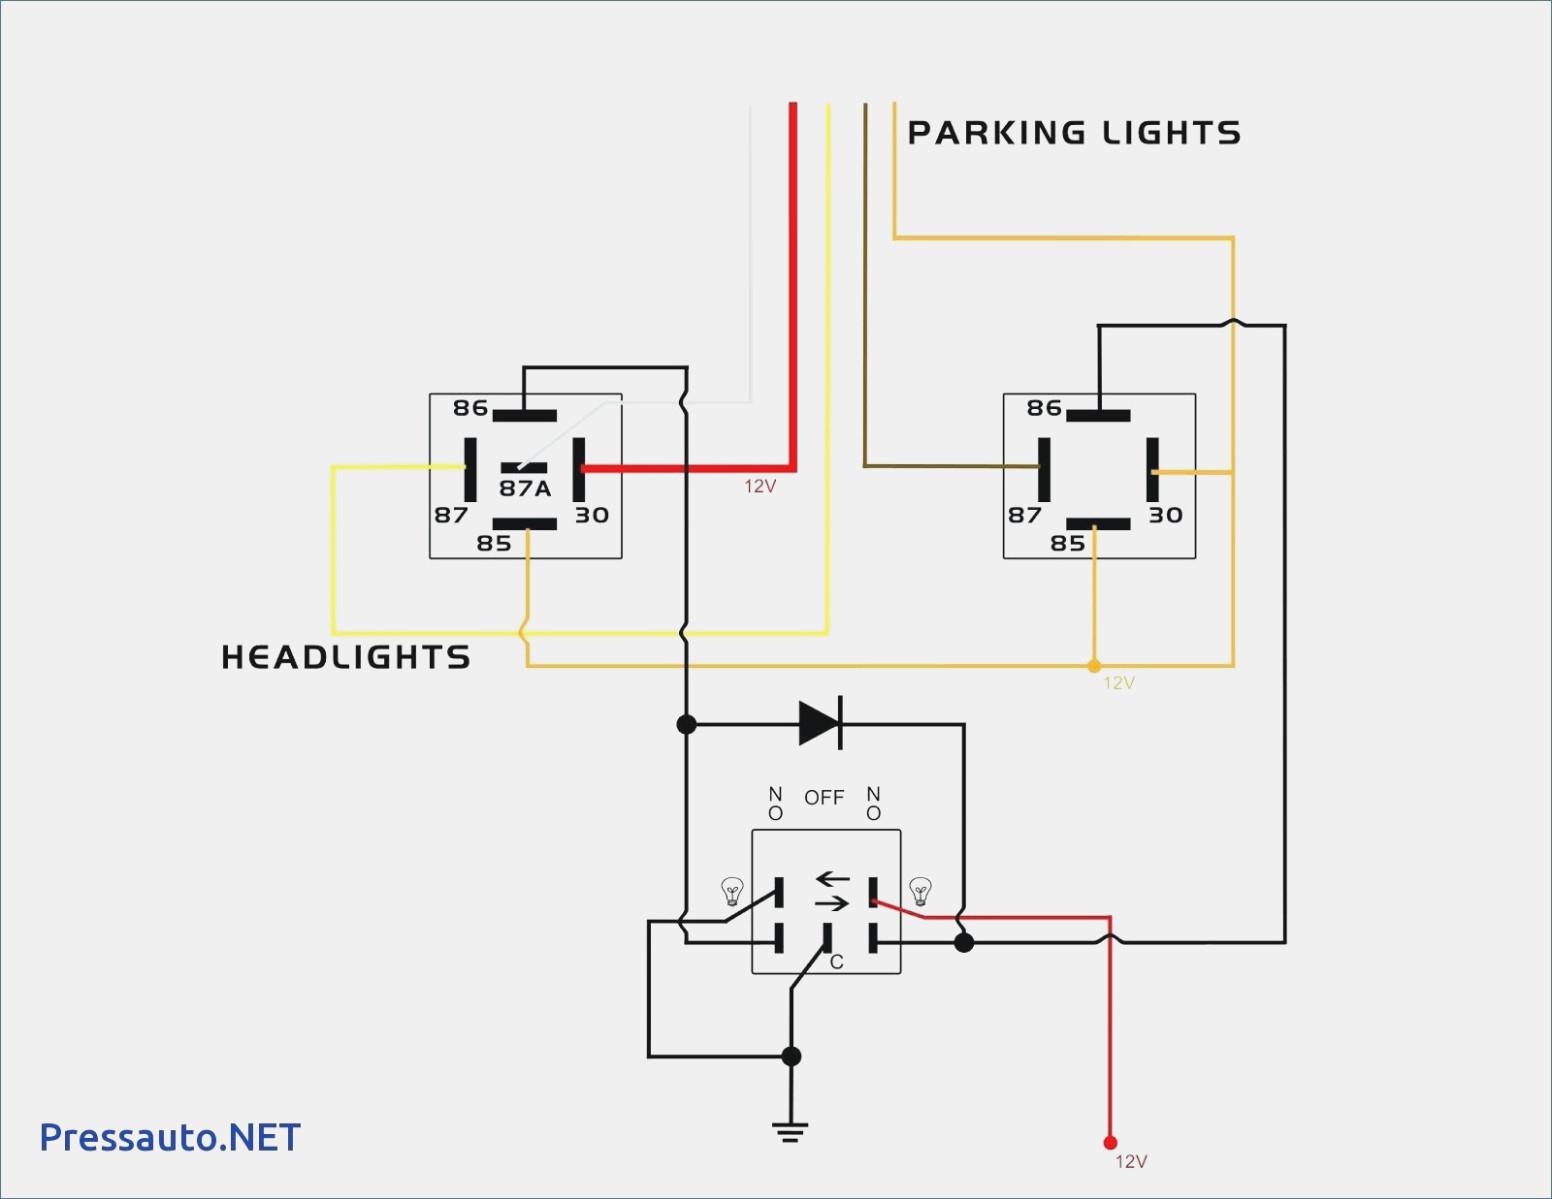 Bennett Trim Tabs Wiring Diagrams | Manual E-Books - Bennett Trim Tab Wiring Diagram